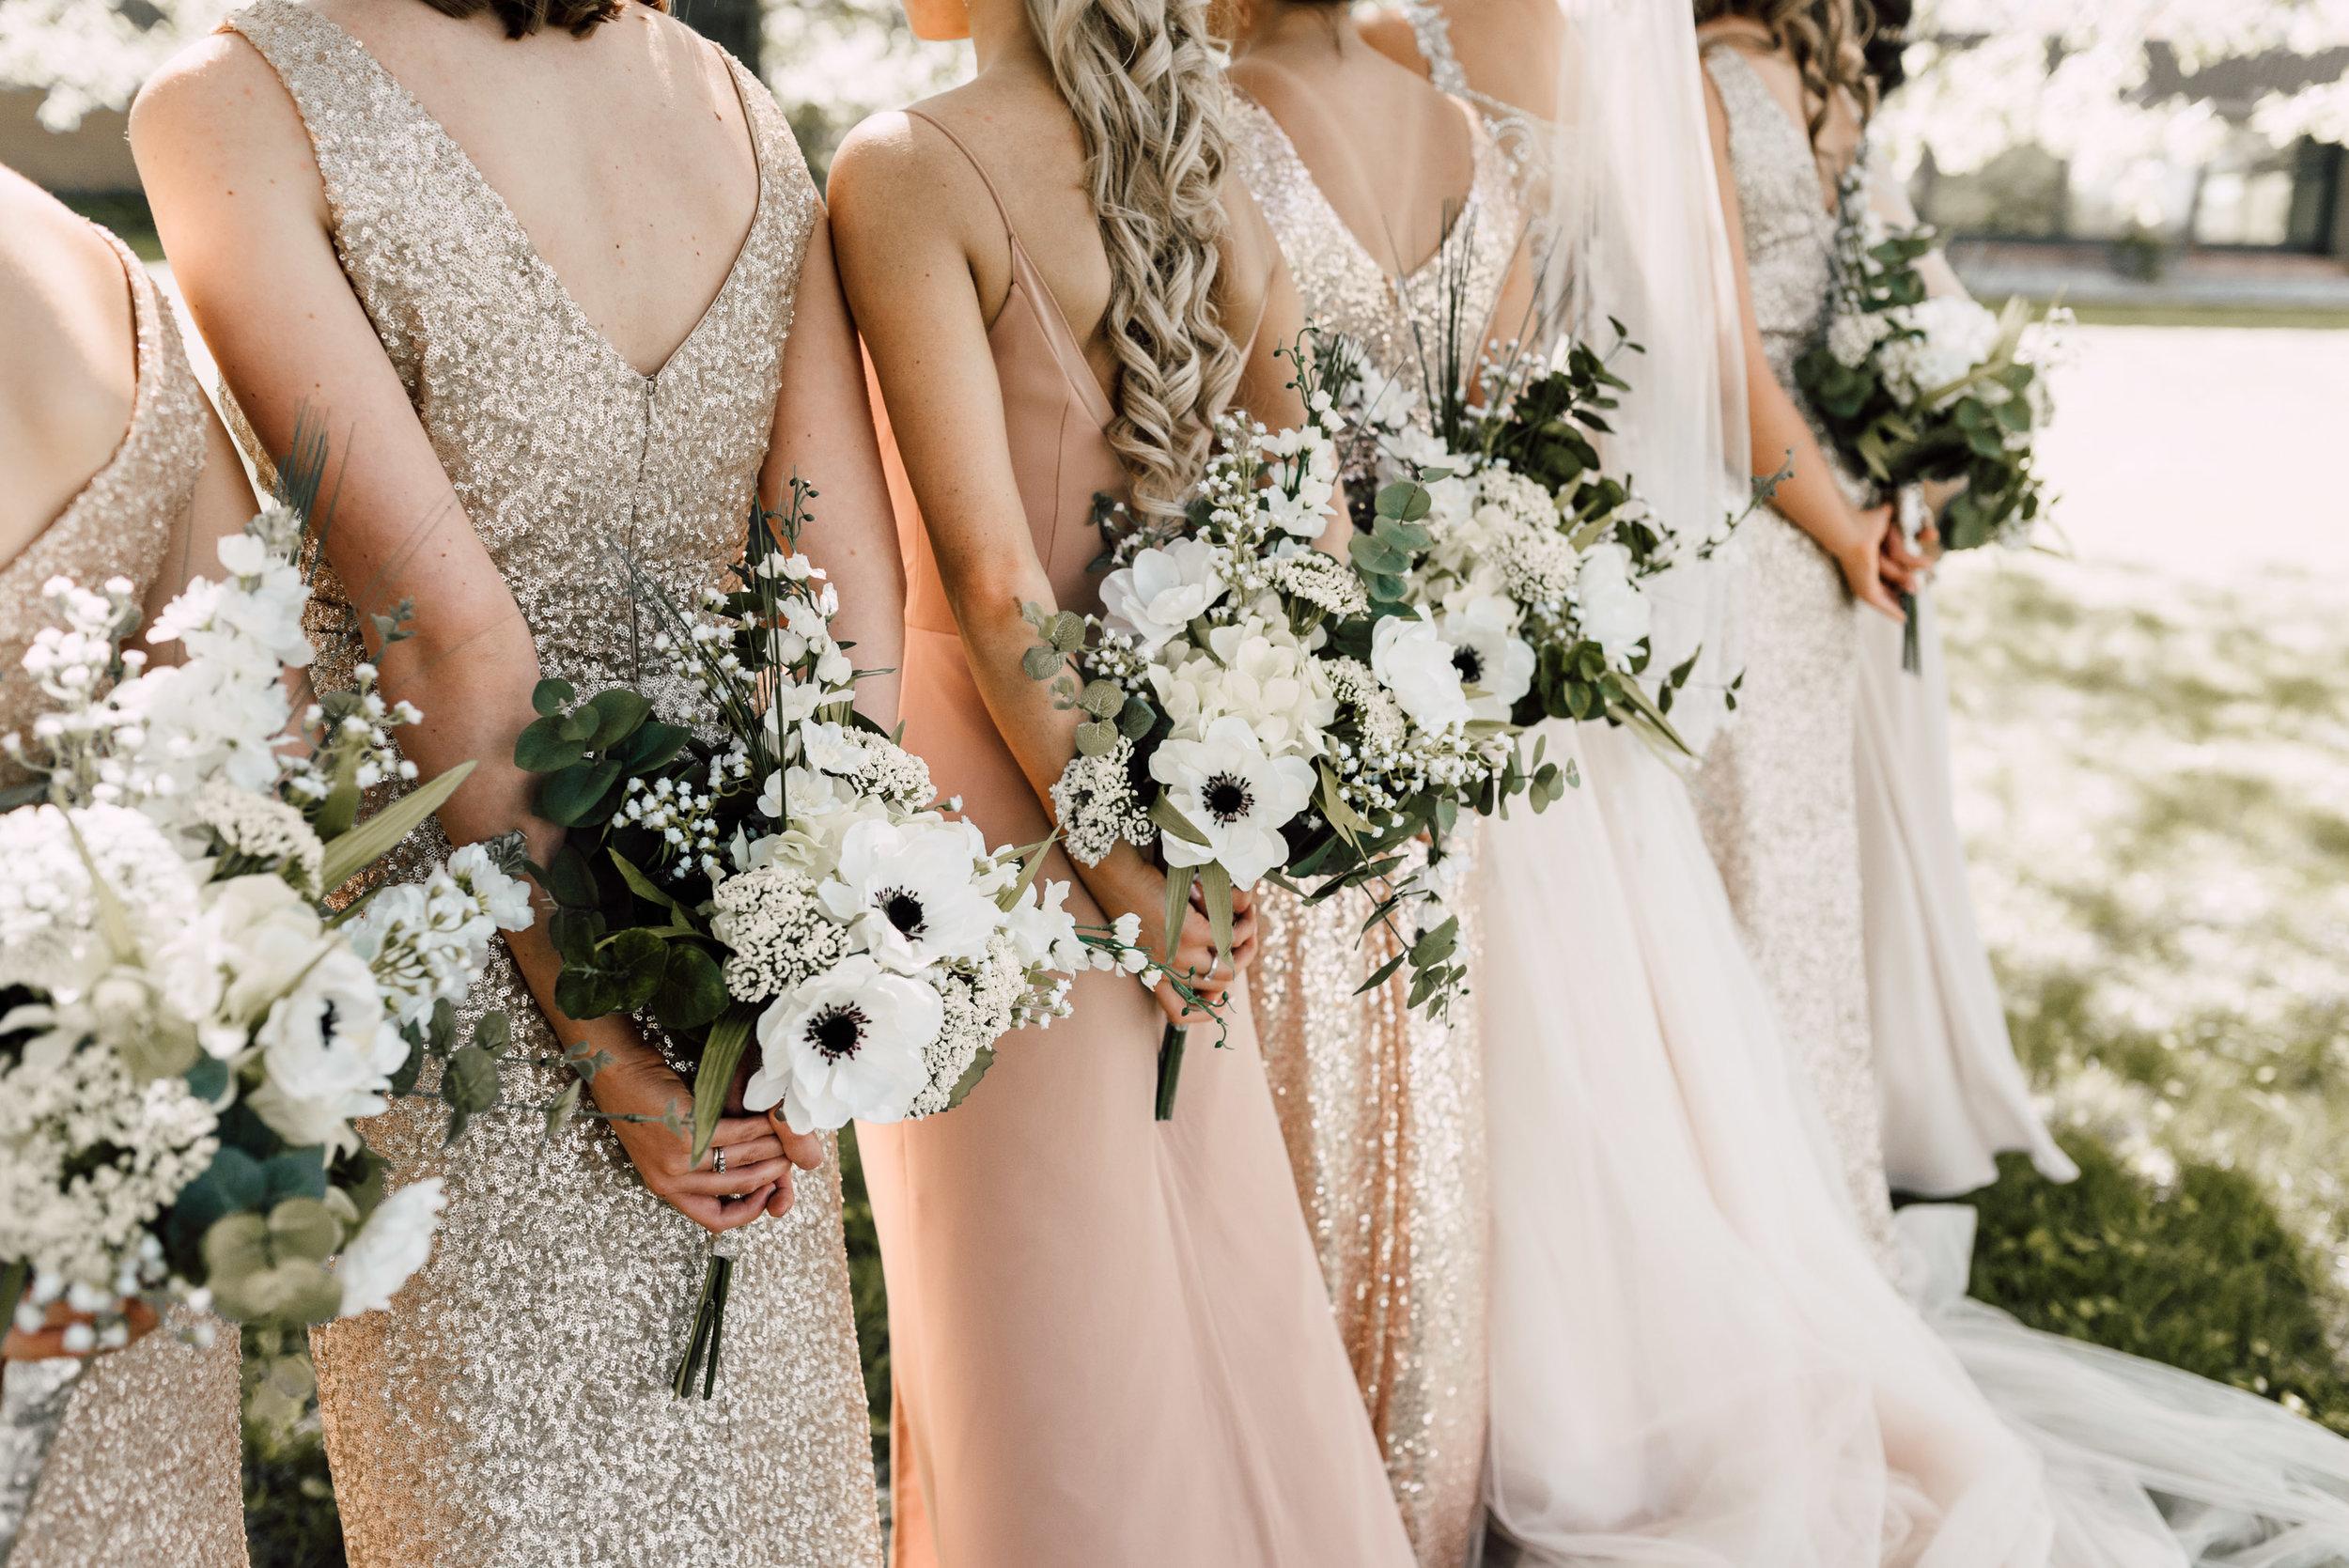 bridesmaid floral ideas, wedding day floral ideas